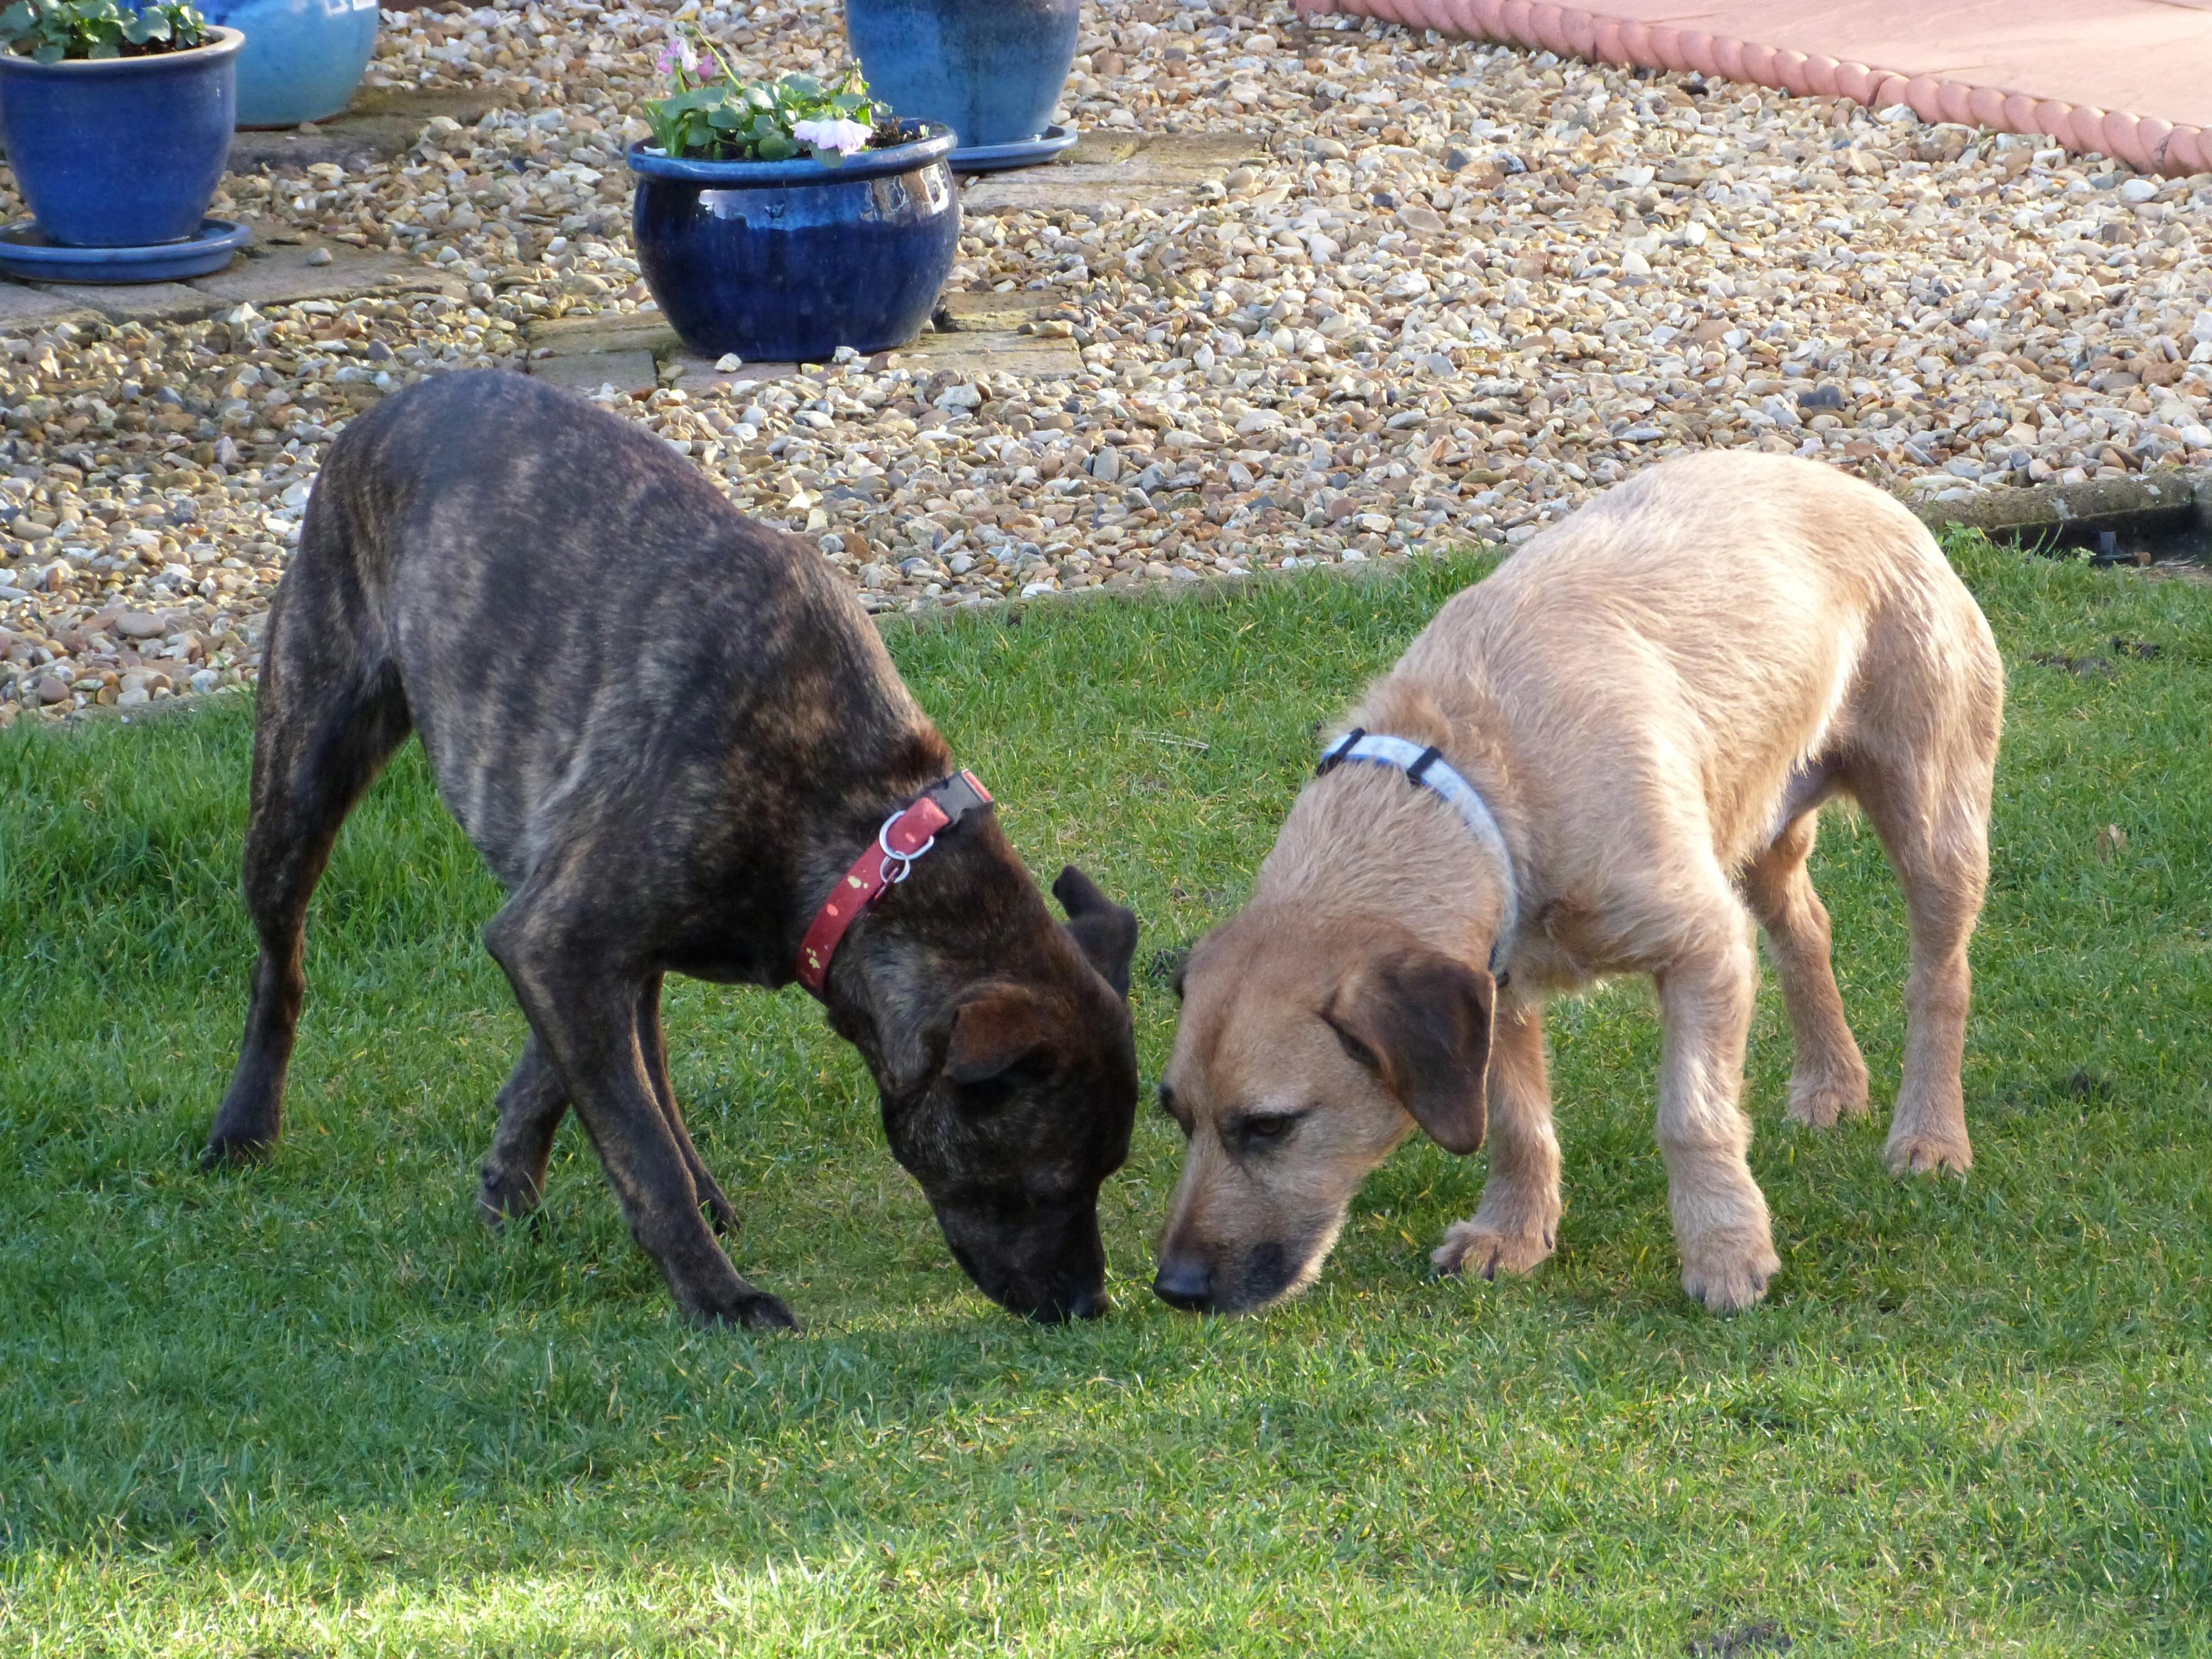 Must see Boerboel Black Adorable Dog - dog-mammal-vertebrate-dog-breed-boerboel-dog-like-mammal-carnivoran-animal-sports-dog-crossbreeds-black-mouth-cur-cimarr-n-uruguayo-17058  Collection_469285  .jpg